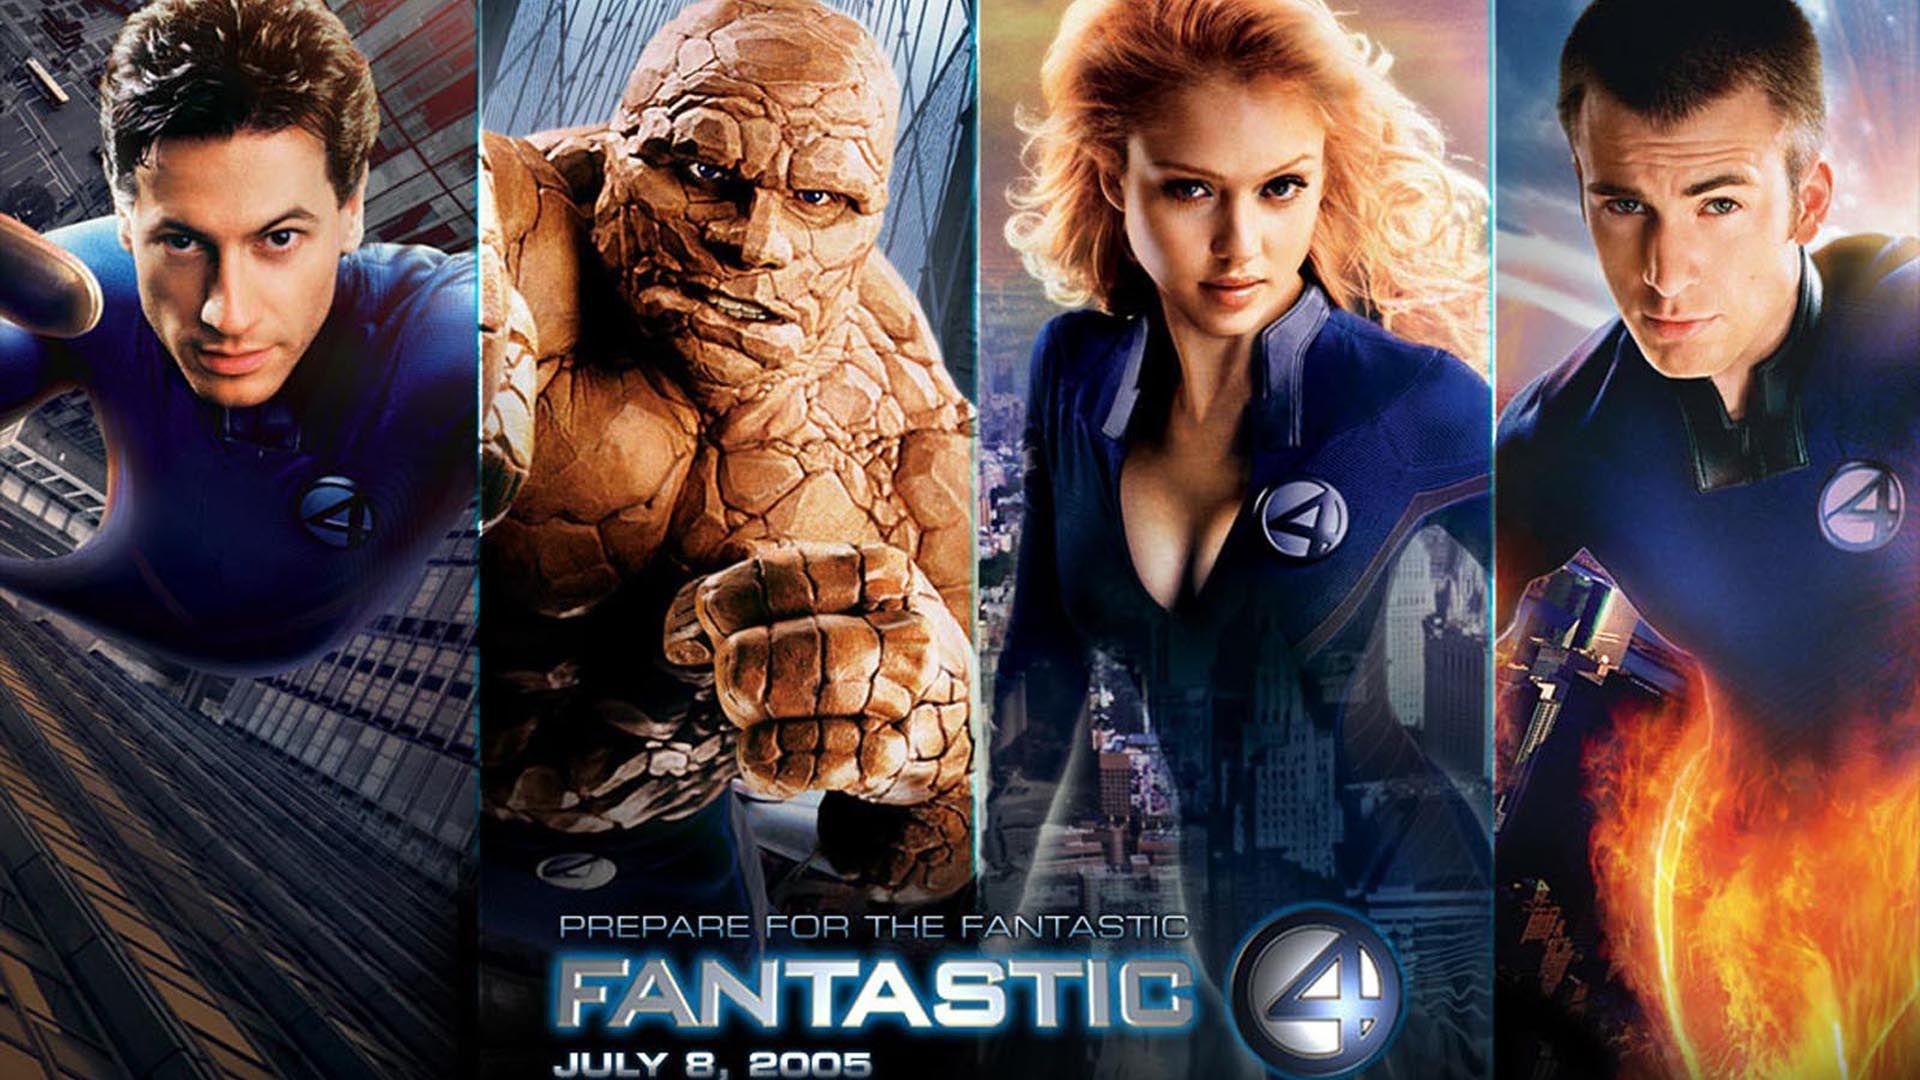 Fantastic 4 Wallpapers Wallpaper Cave Fantastic Four Movie Fantastic Four Bloopers